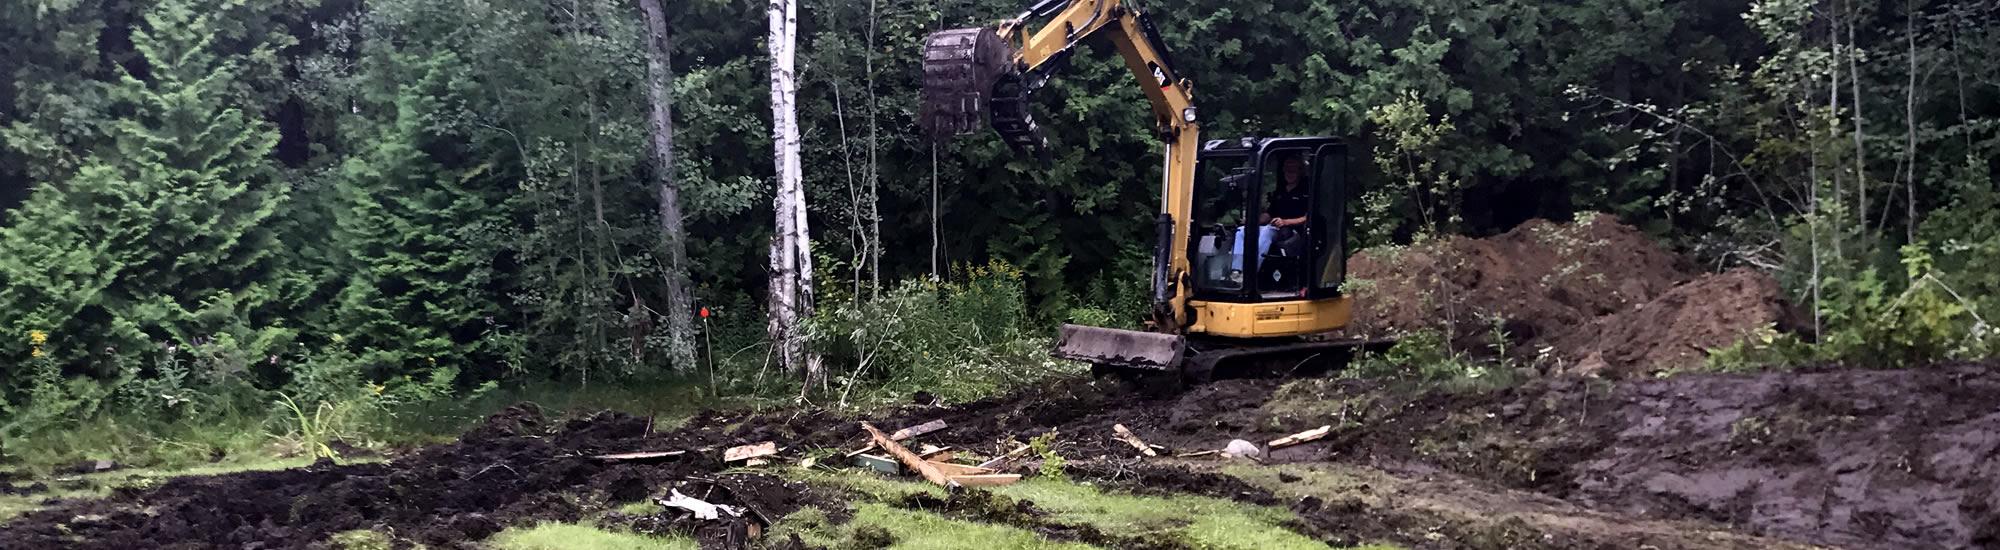 Header Image - castlefordexcavating-residential-landscaping-1-1531229299.jpg